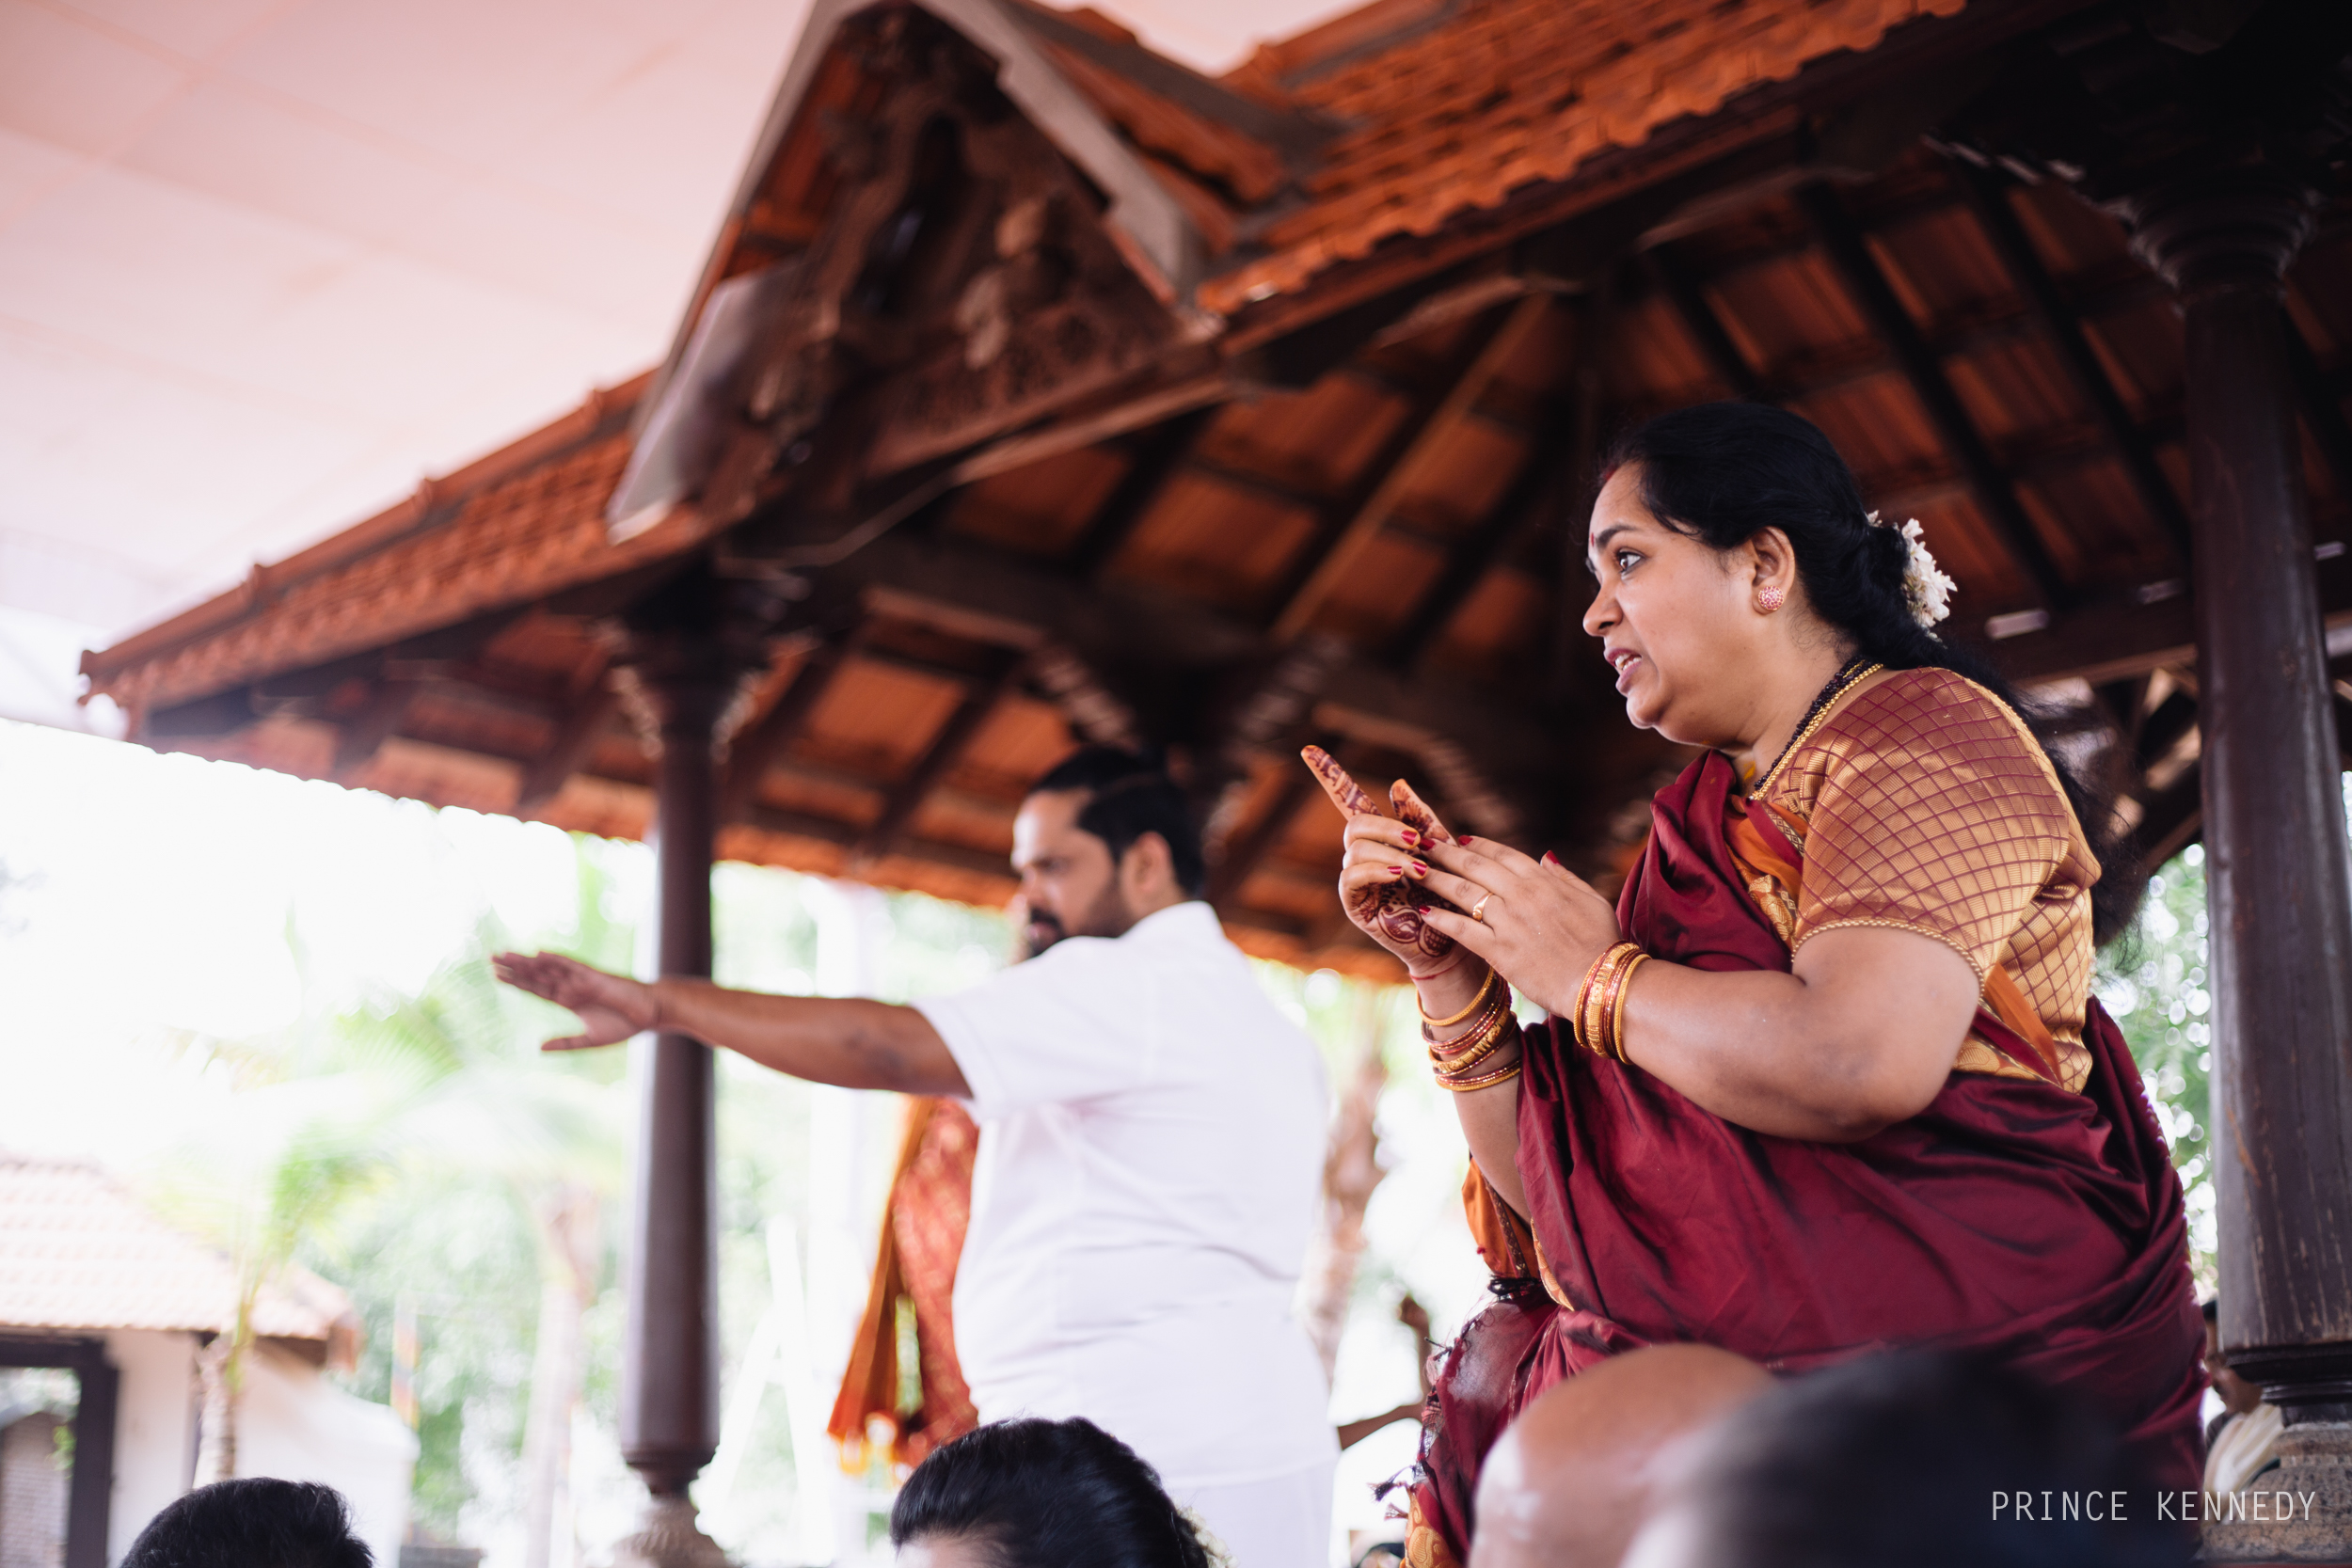 Athmajja-Nithesh-Engagement-Couple-Portrait-Portraiture-Wedding-Couple-Portrait-Chennai-Photographer-Candid-Photography-Destination-Best-Prince-Kennedy-Photography-103.jpg